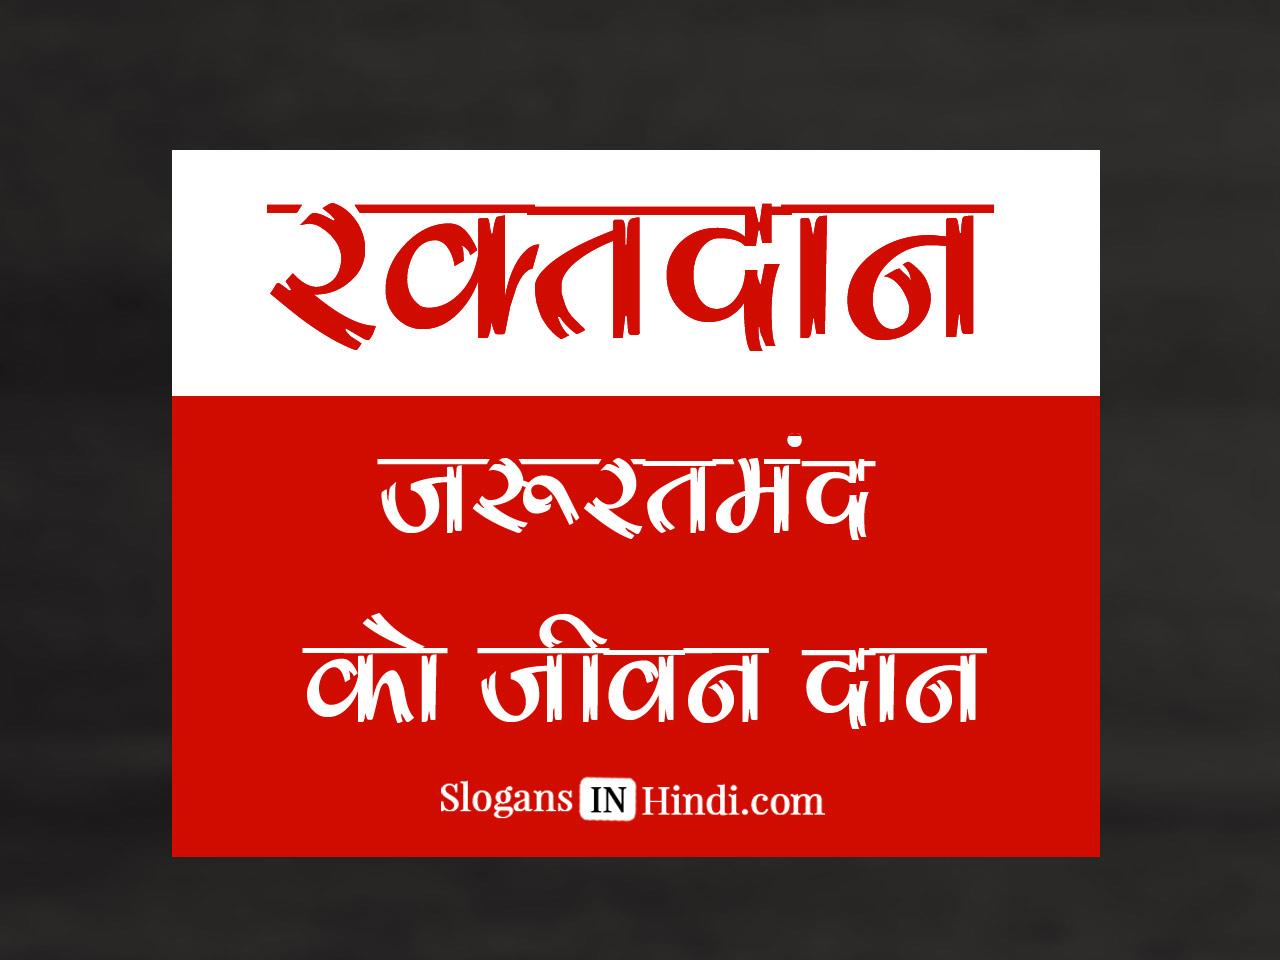 Blood Donation Slogans In Hindi